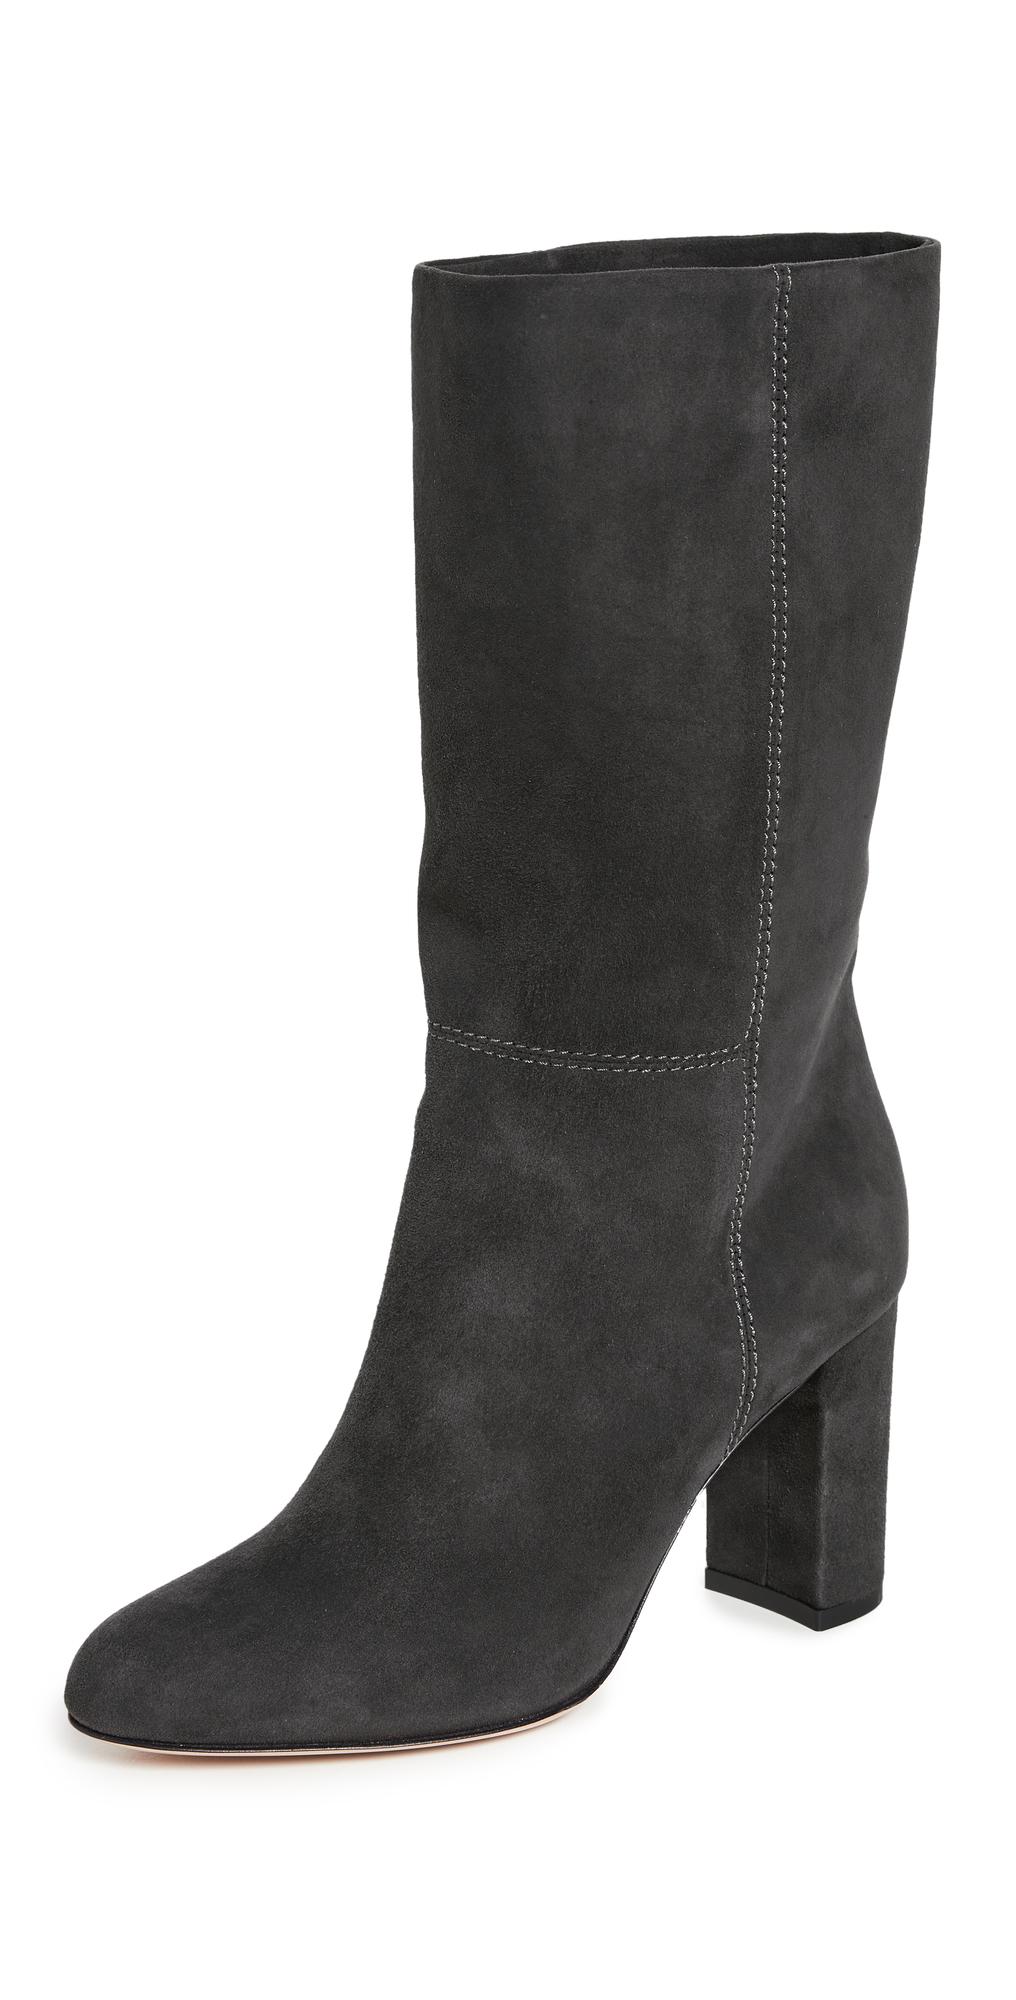 Delila Boots